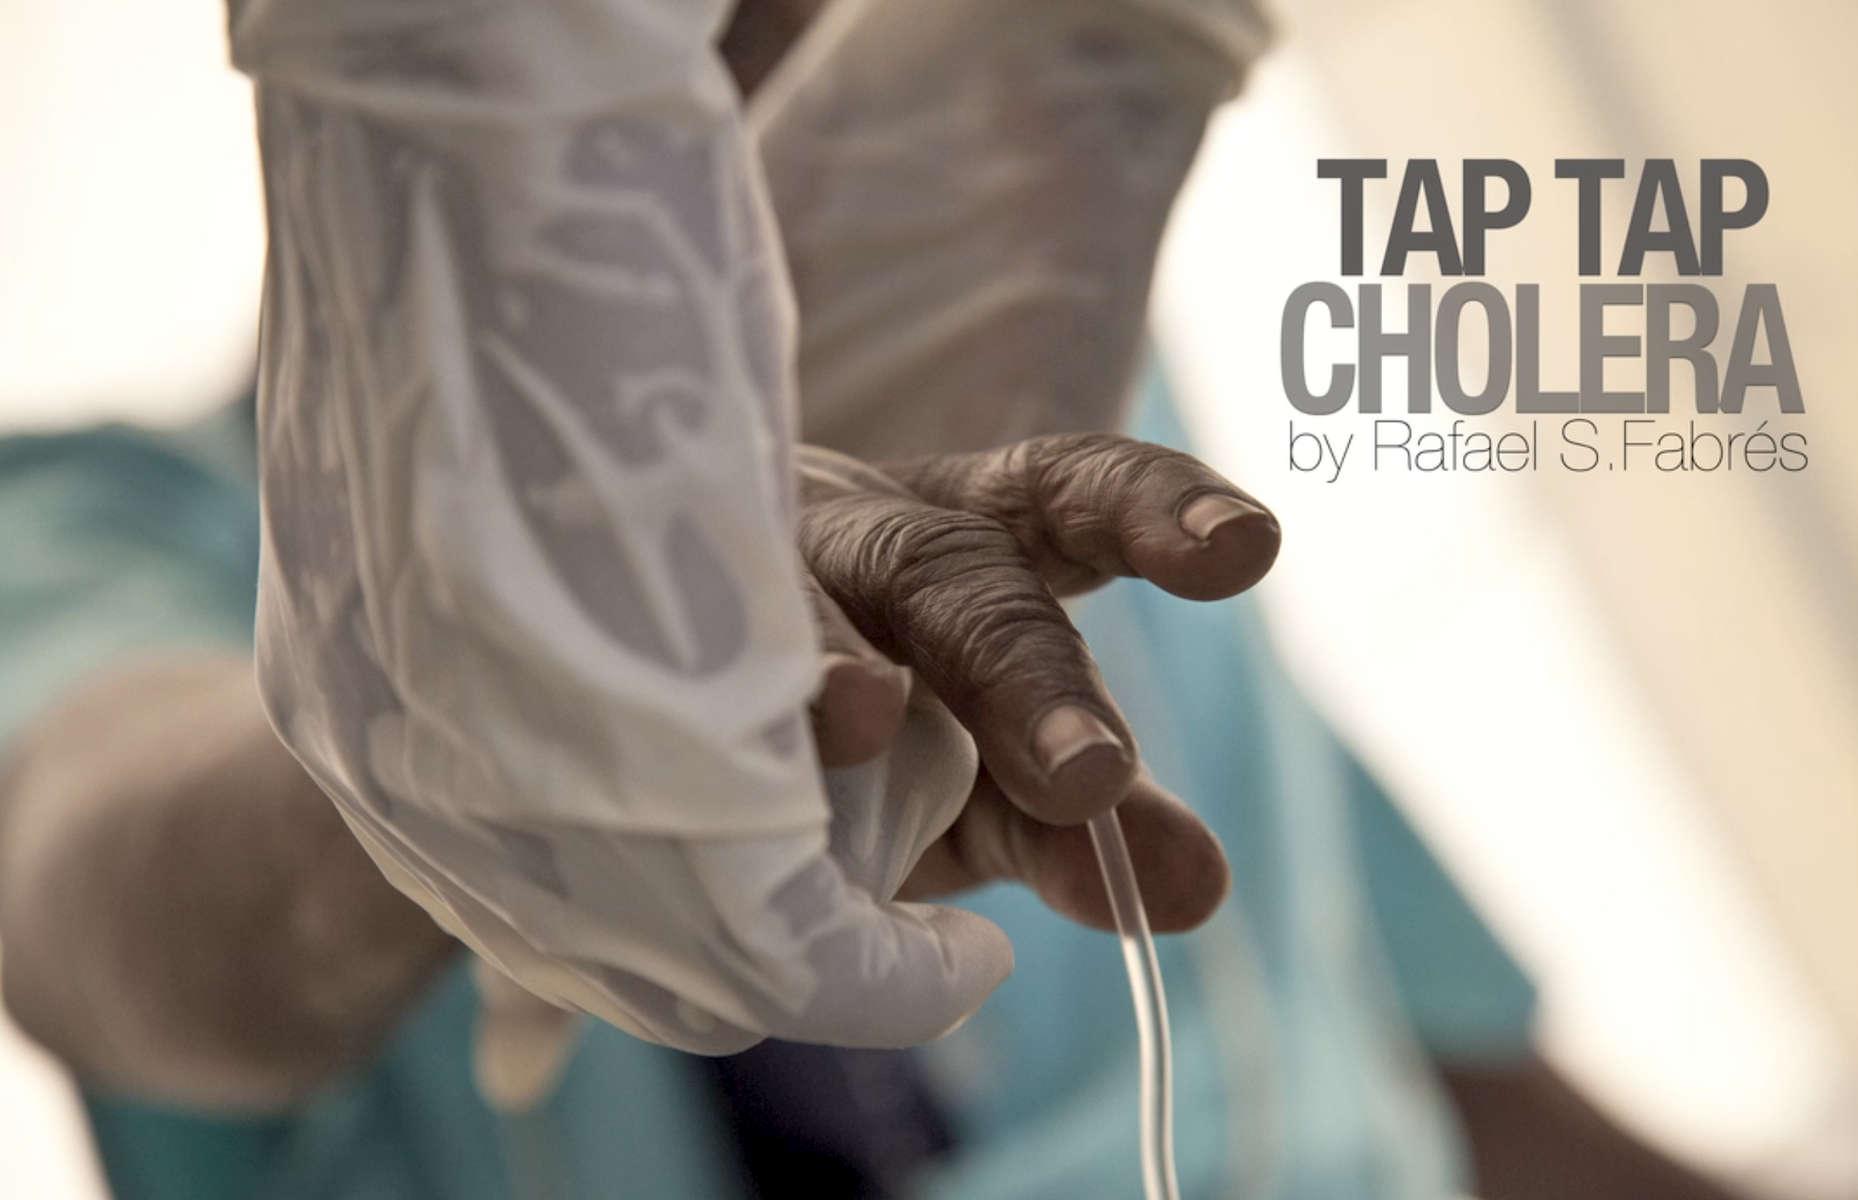 {quote}TAP TAP CHOLERA{quote} | RAFAEL FABRÉS: PHOTOGRAPHY, SOUND & CINEMATOGRAPHY